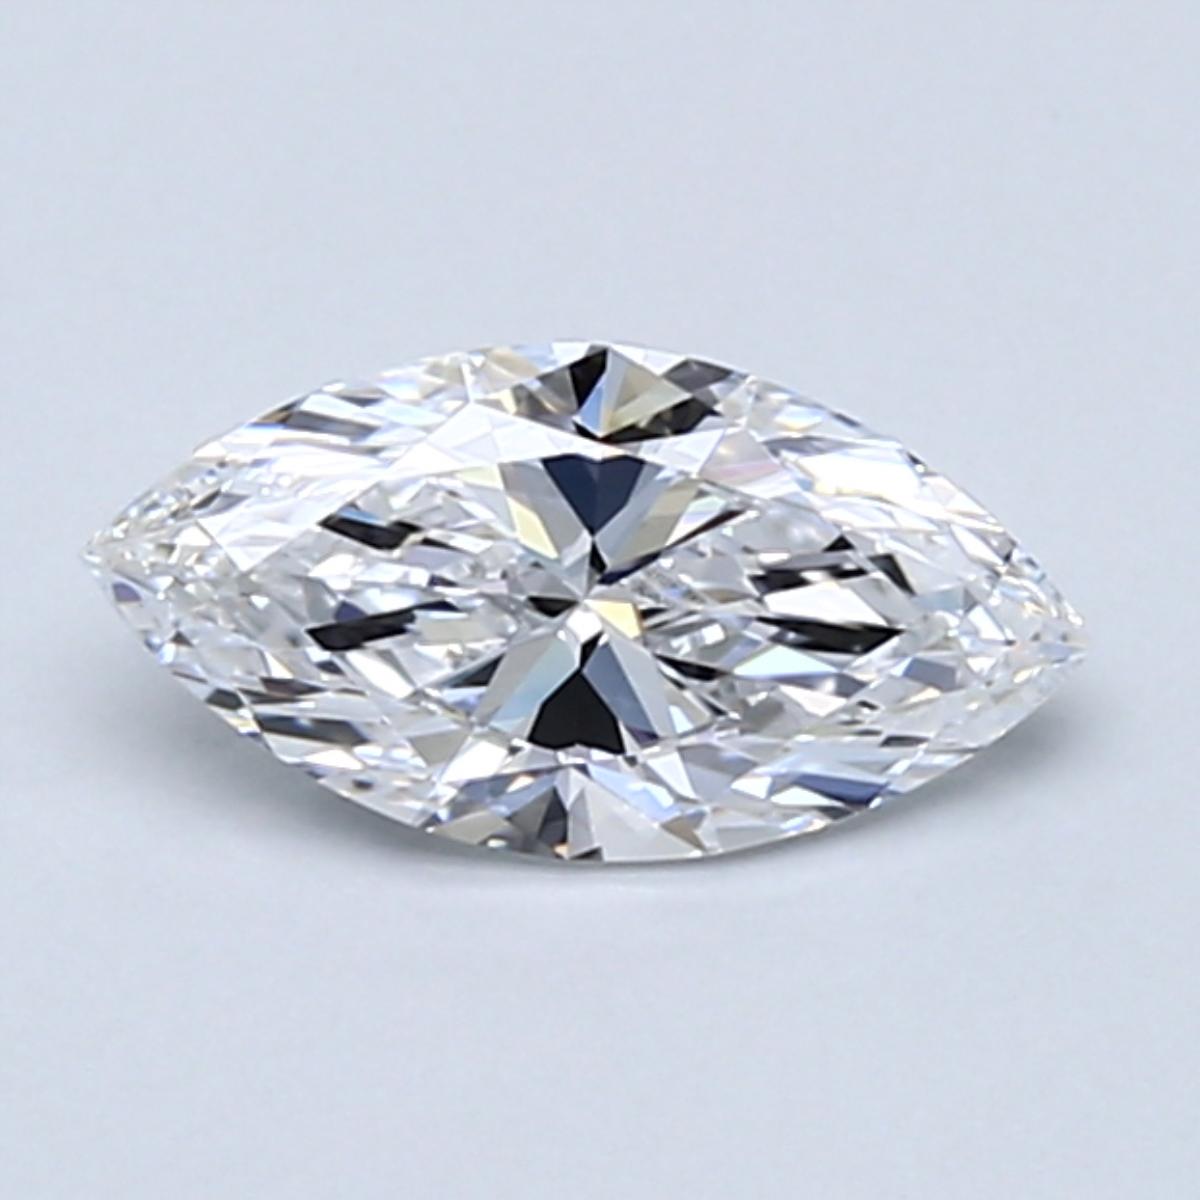 0.70-Carat Marquise Cut Diamond by Blue Nile